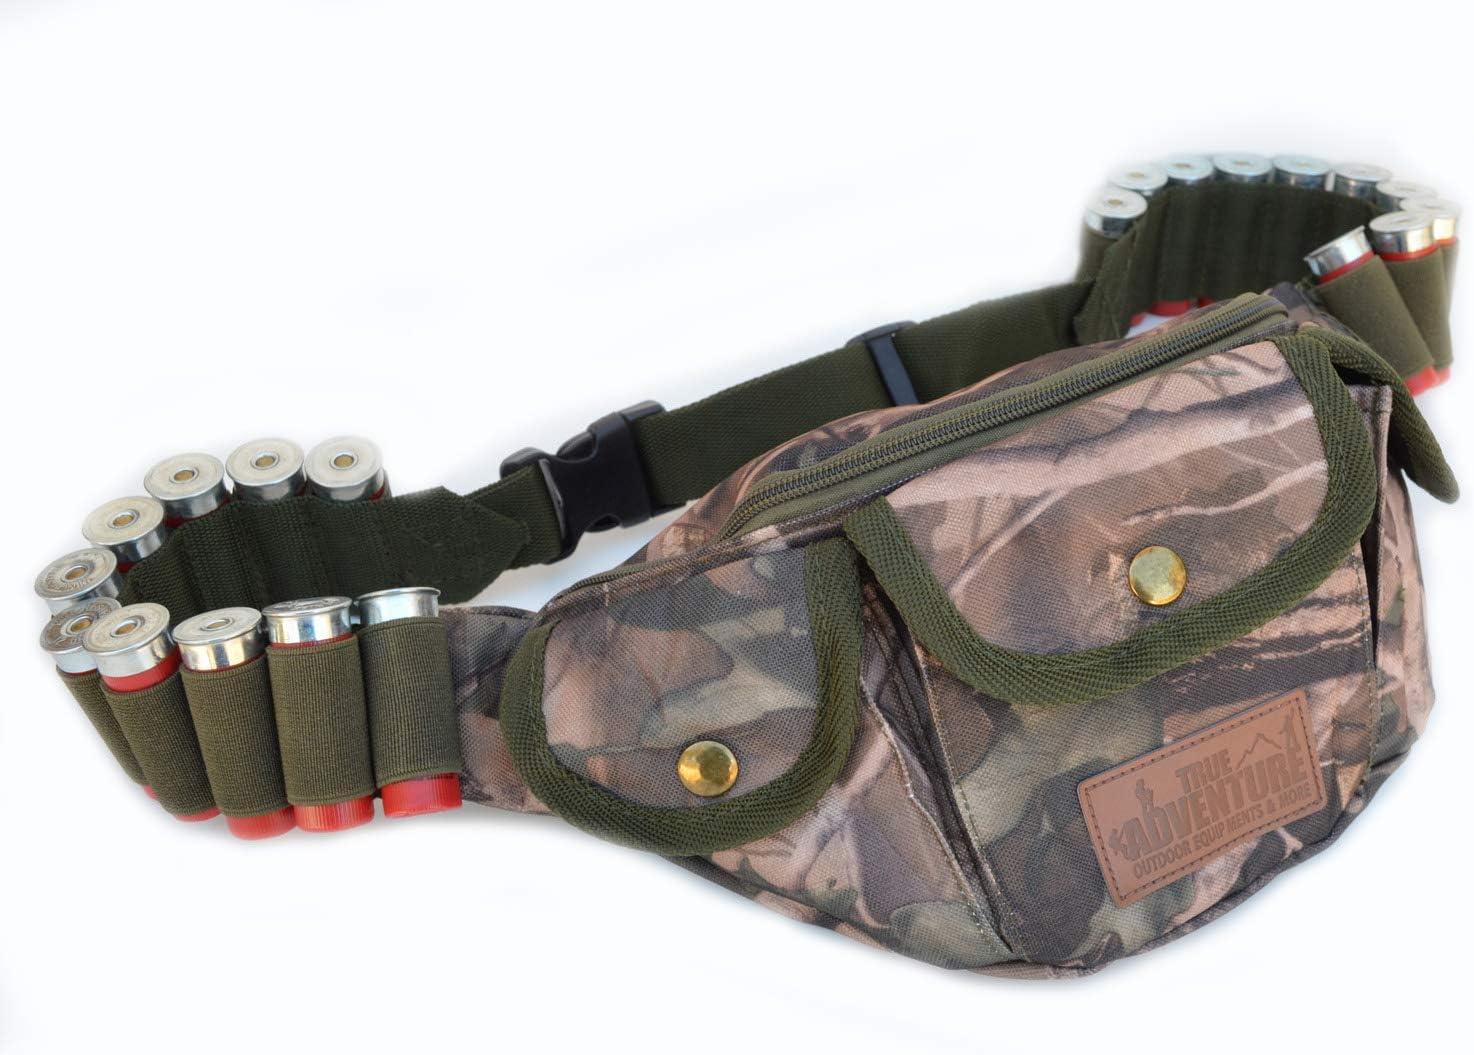 Acid Tactical Hunting Shotgun Shell Carrier Gun Waist Belt Bag Real Camouflage Real Woods CAMO 71hn554hq2BL